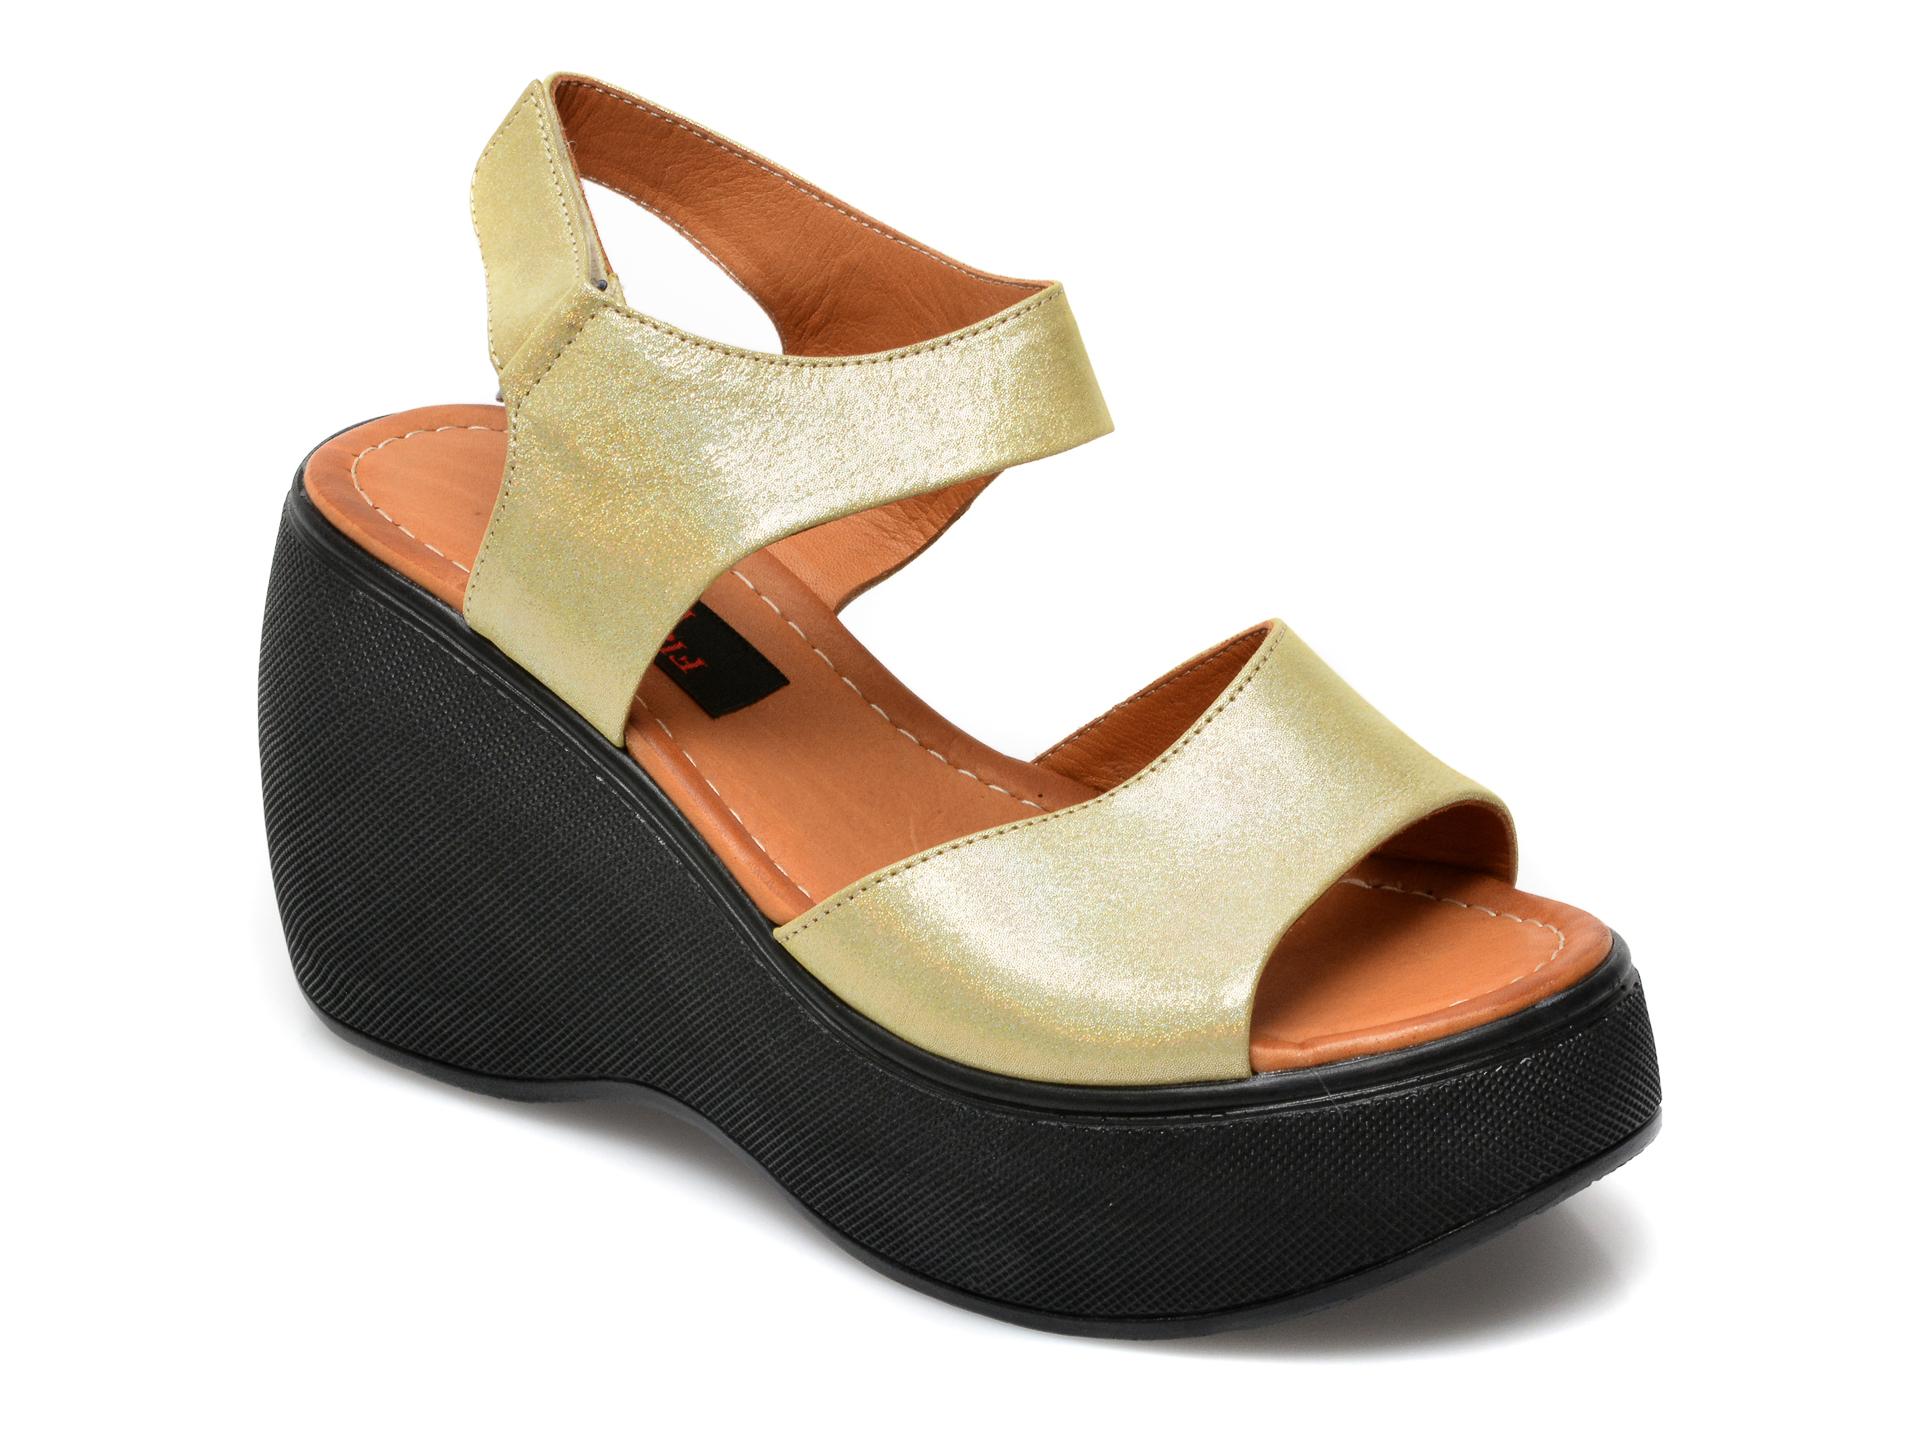 Sandale FLAVIA PASSINI galbene, 2482SH, din piele naturala